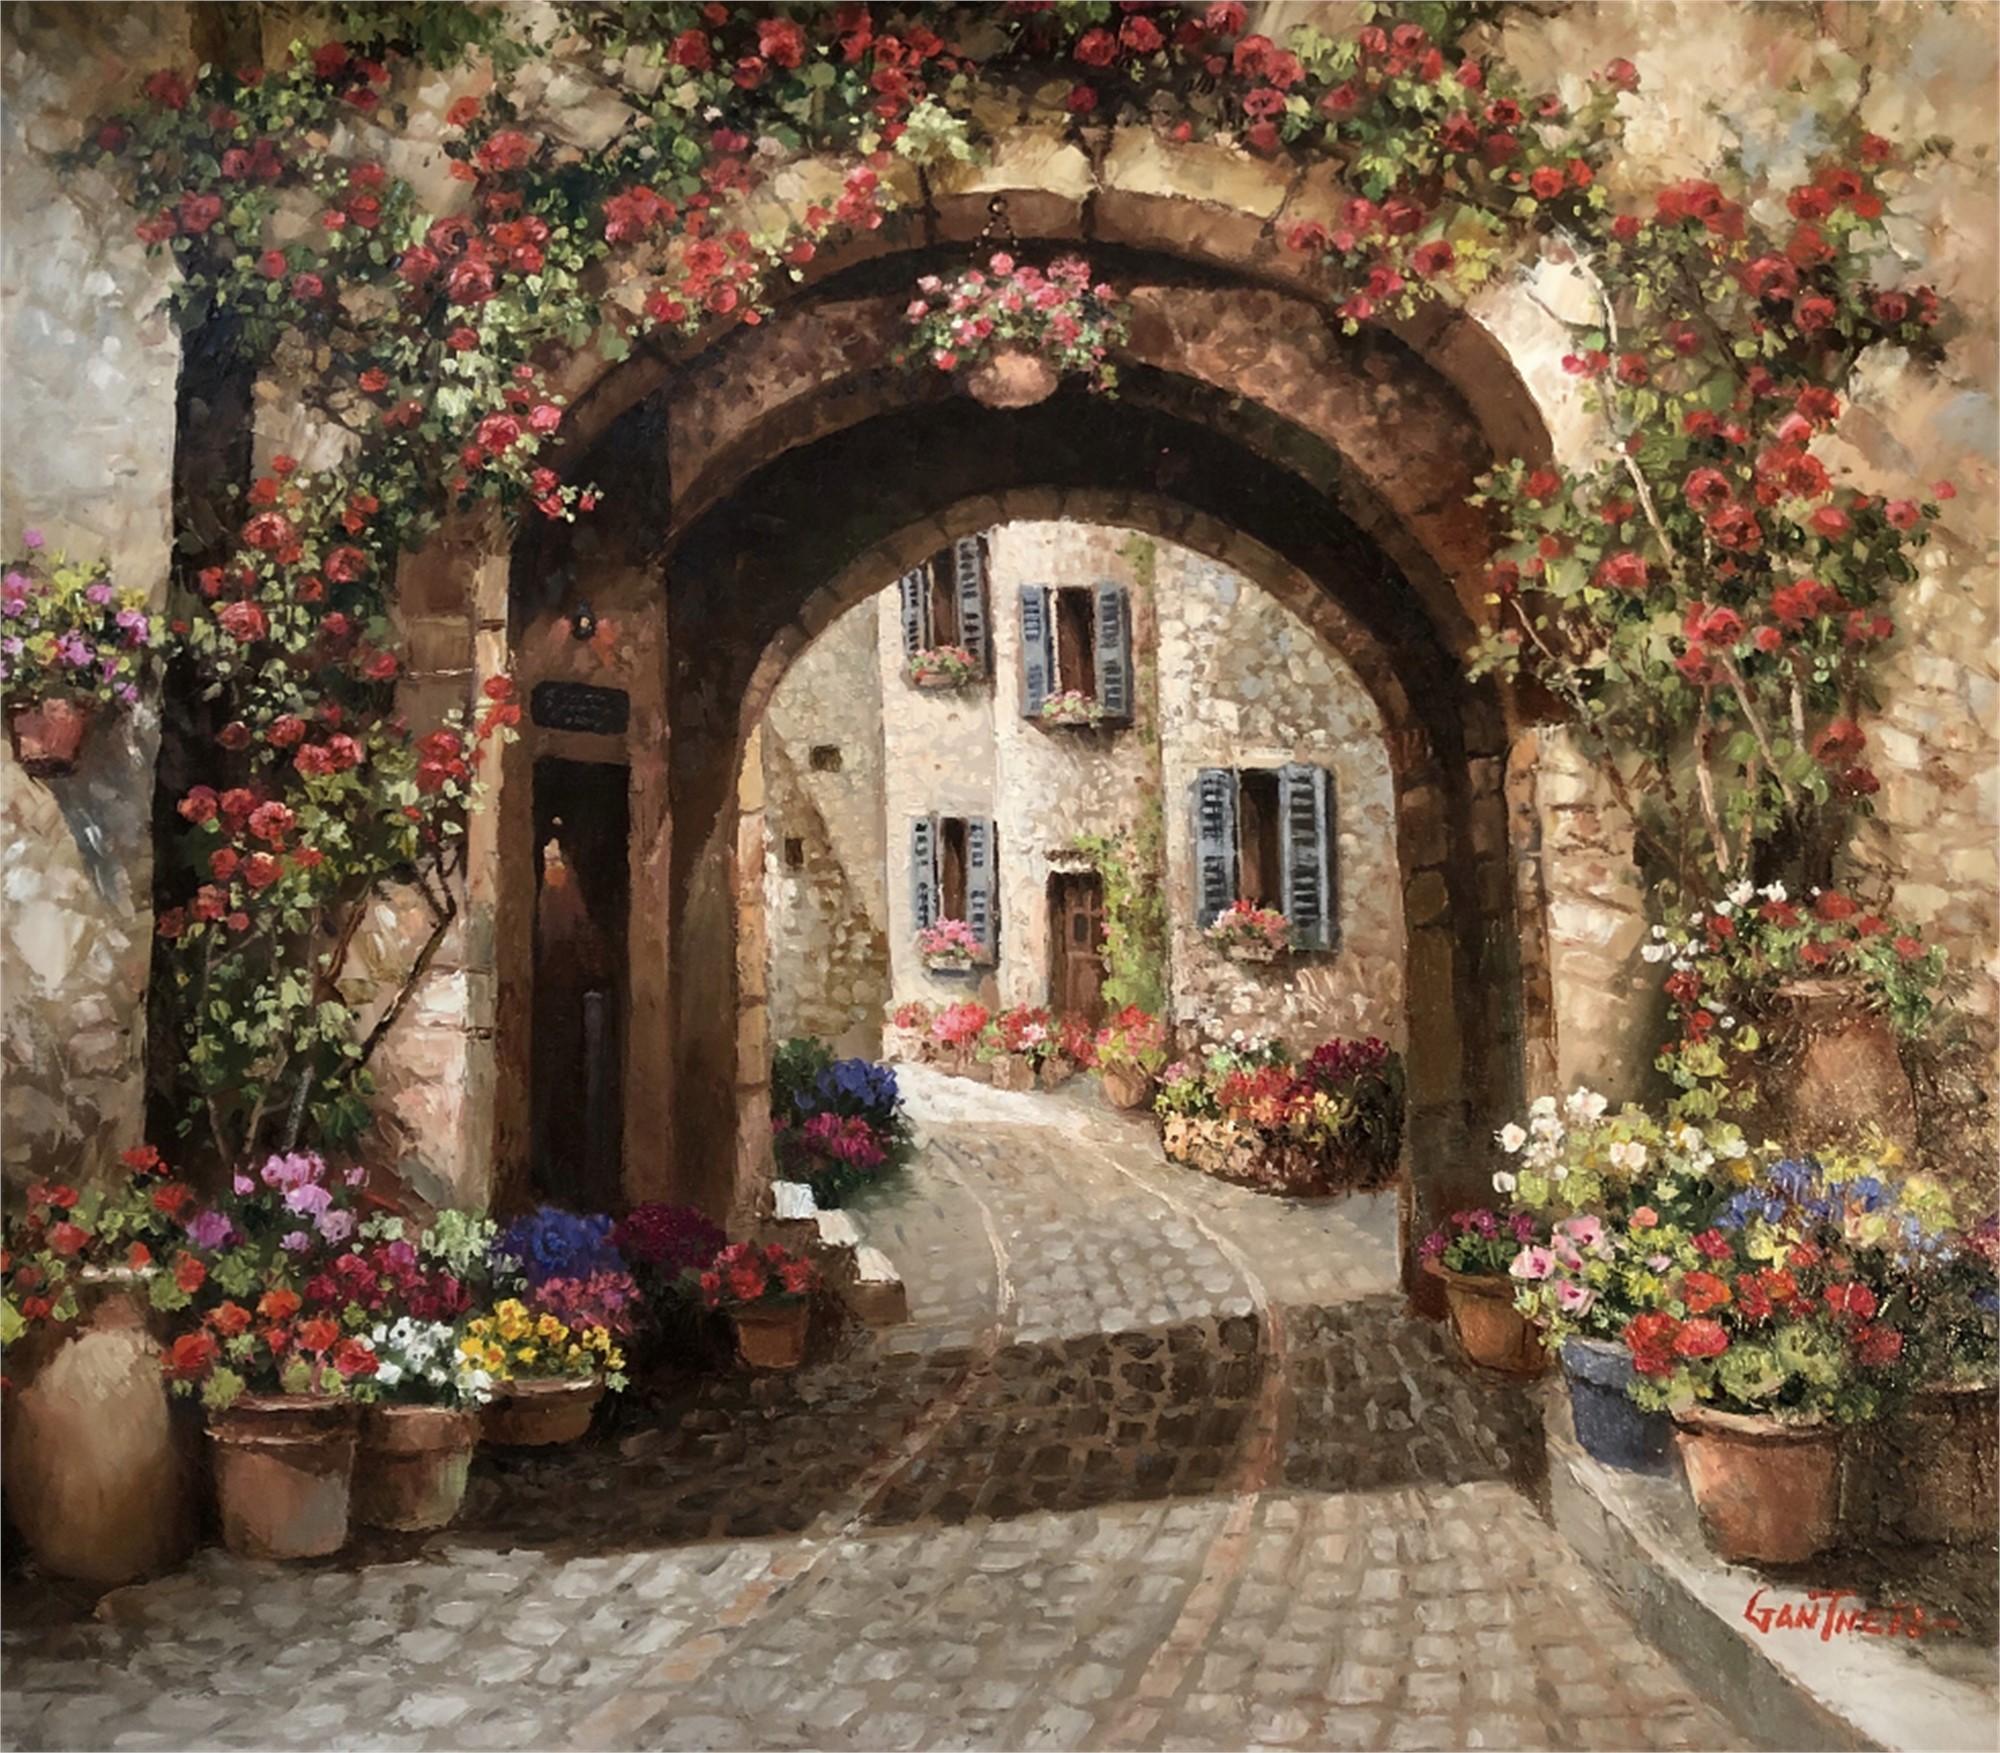 Romance in Tuscany by GANTNER